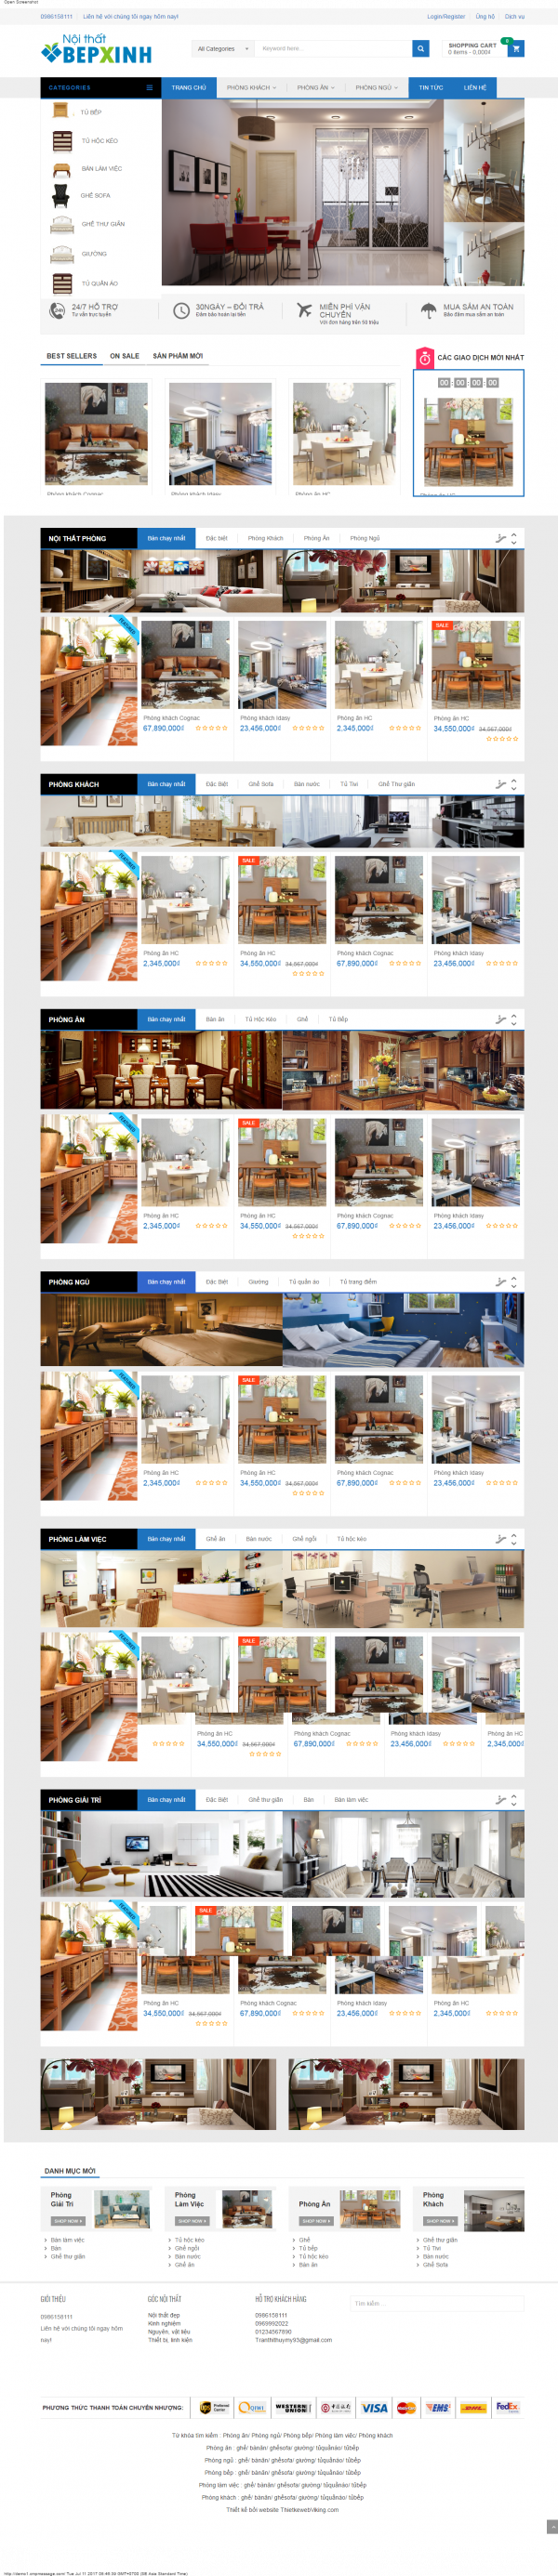 Thiết kế web nội thất mẫu 11